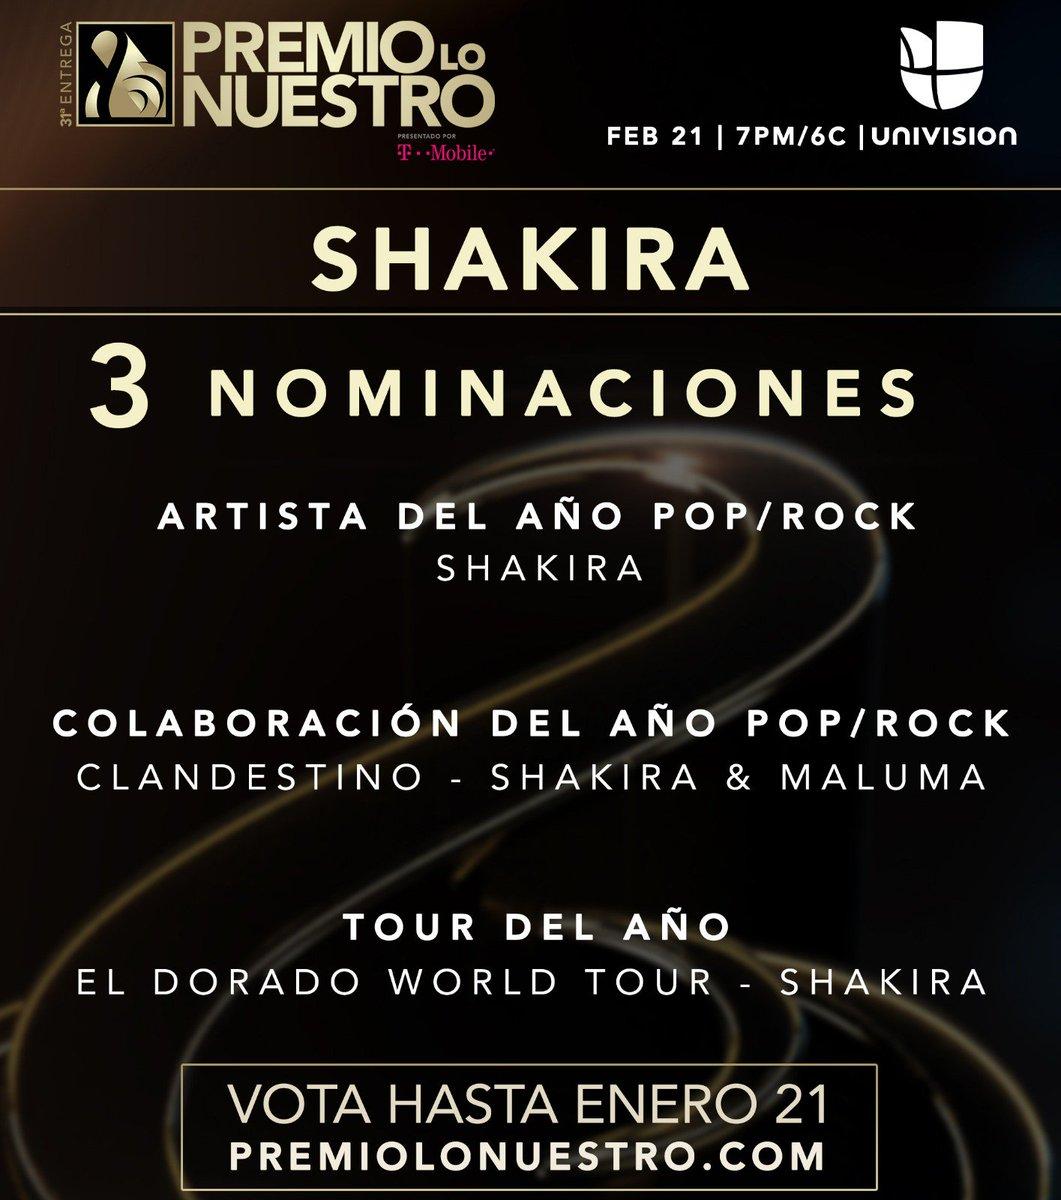 Shakira >> preparando nuevo álbum DwZdegOWoAE3d19